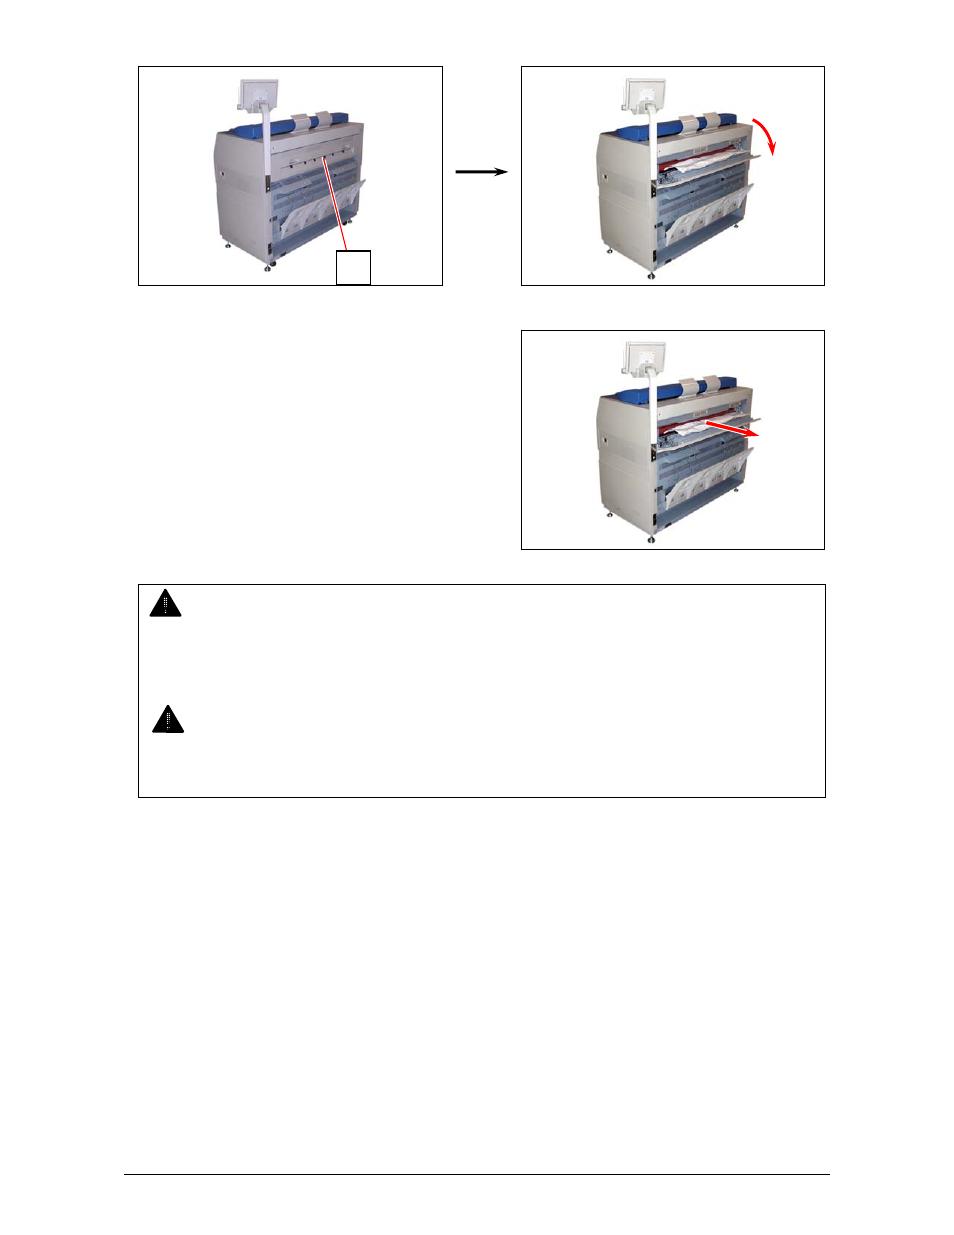 warning konica minolta kip 3100 user manual page 46 56 rh manualsdir com kip 3100 service manual kip 3100 parts manual